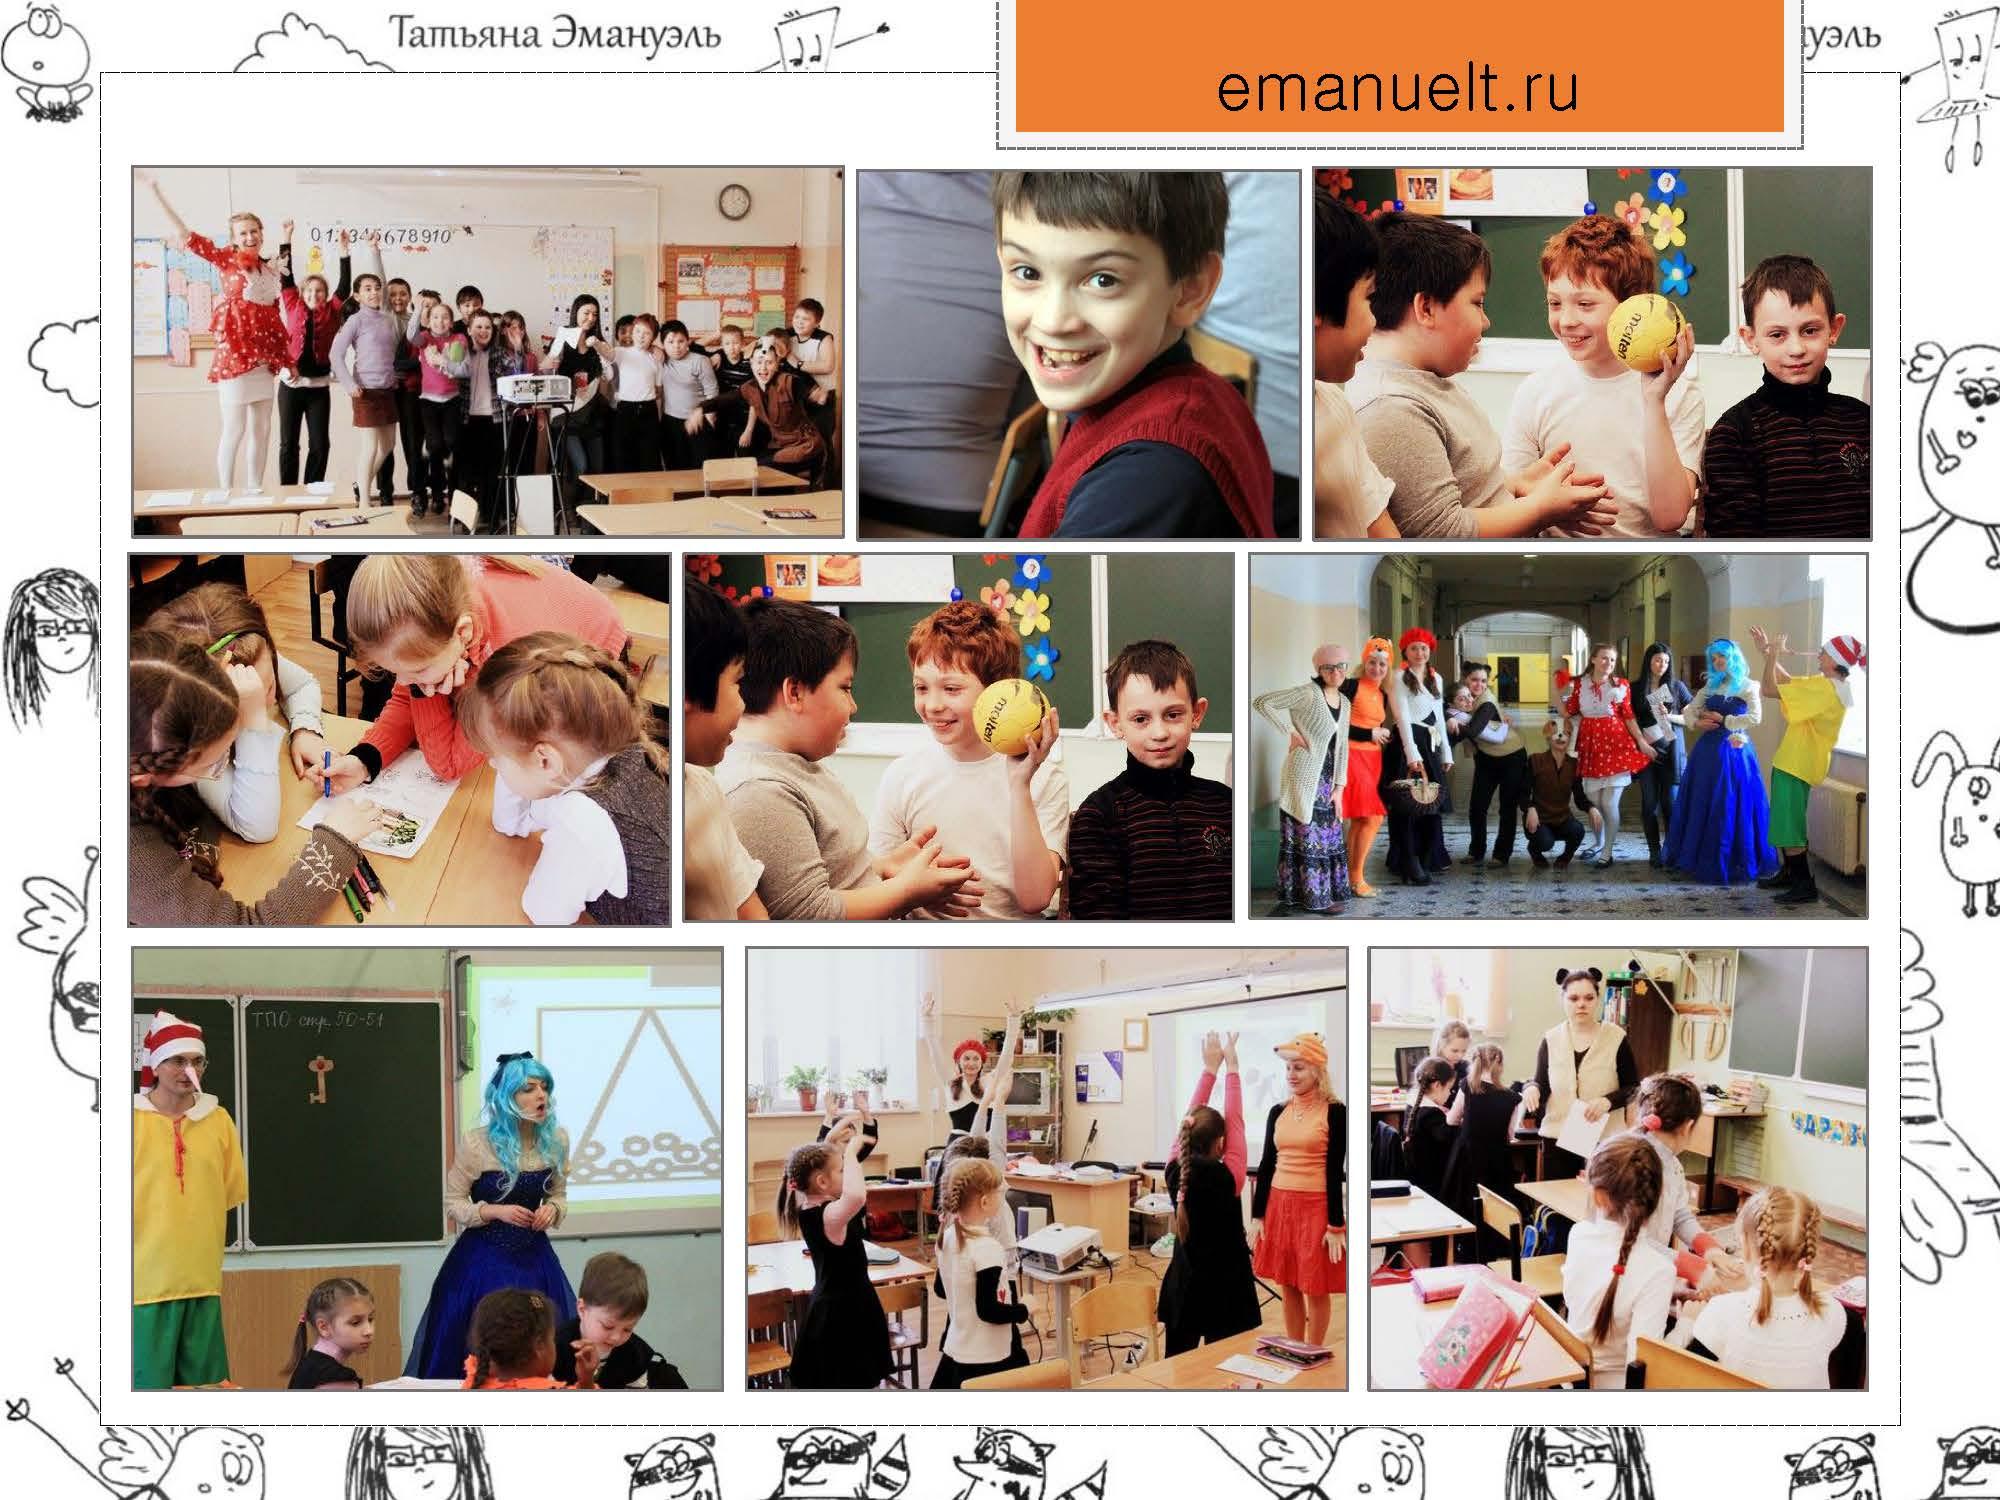 RazBeG_Emanuel_Страница_15